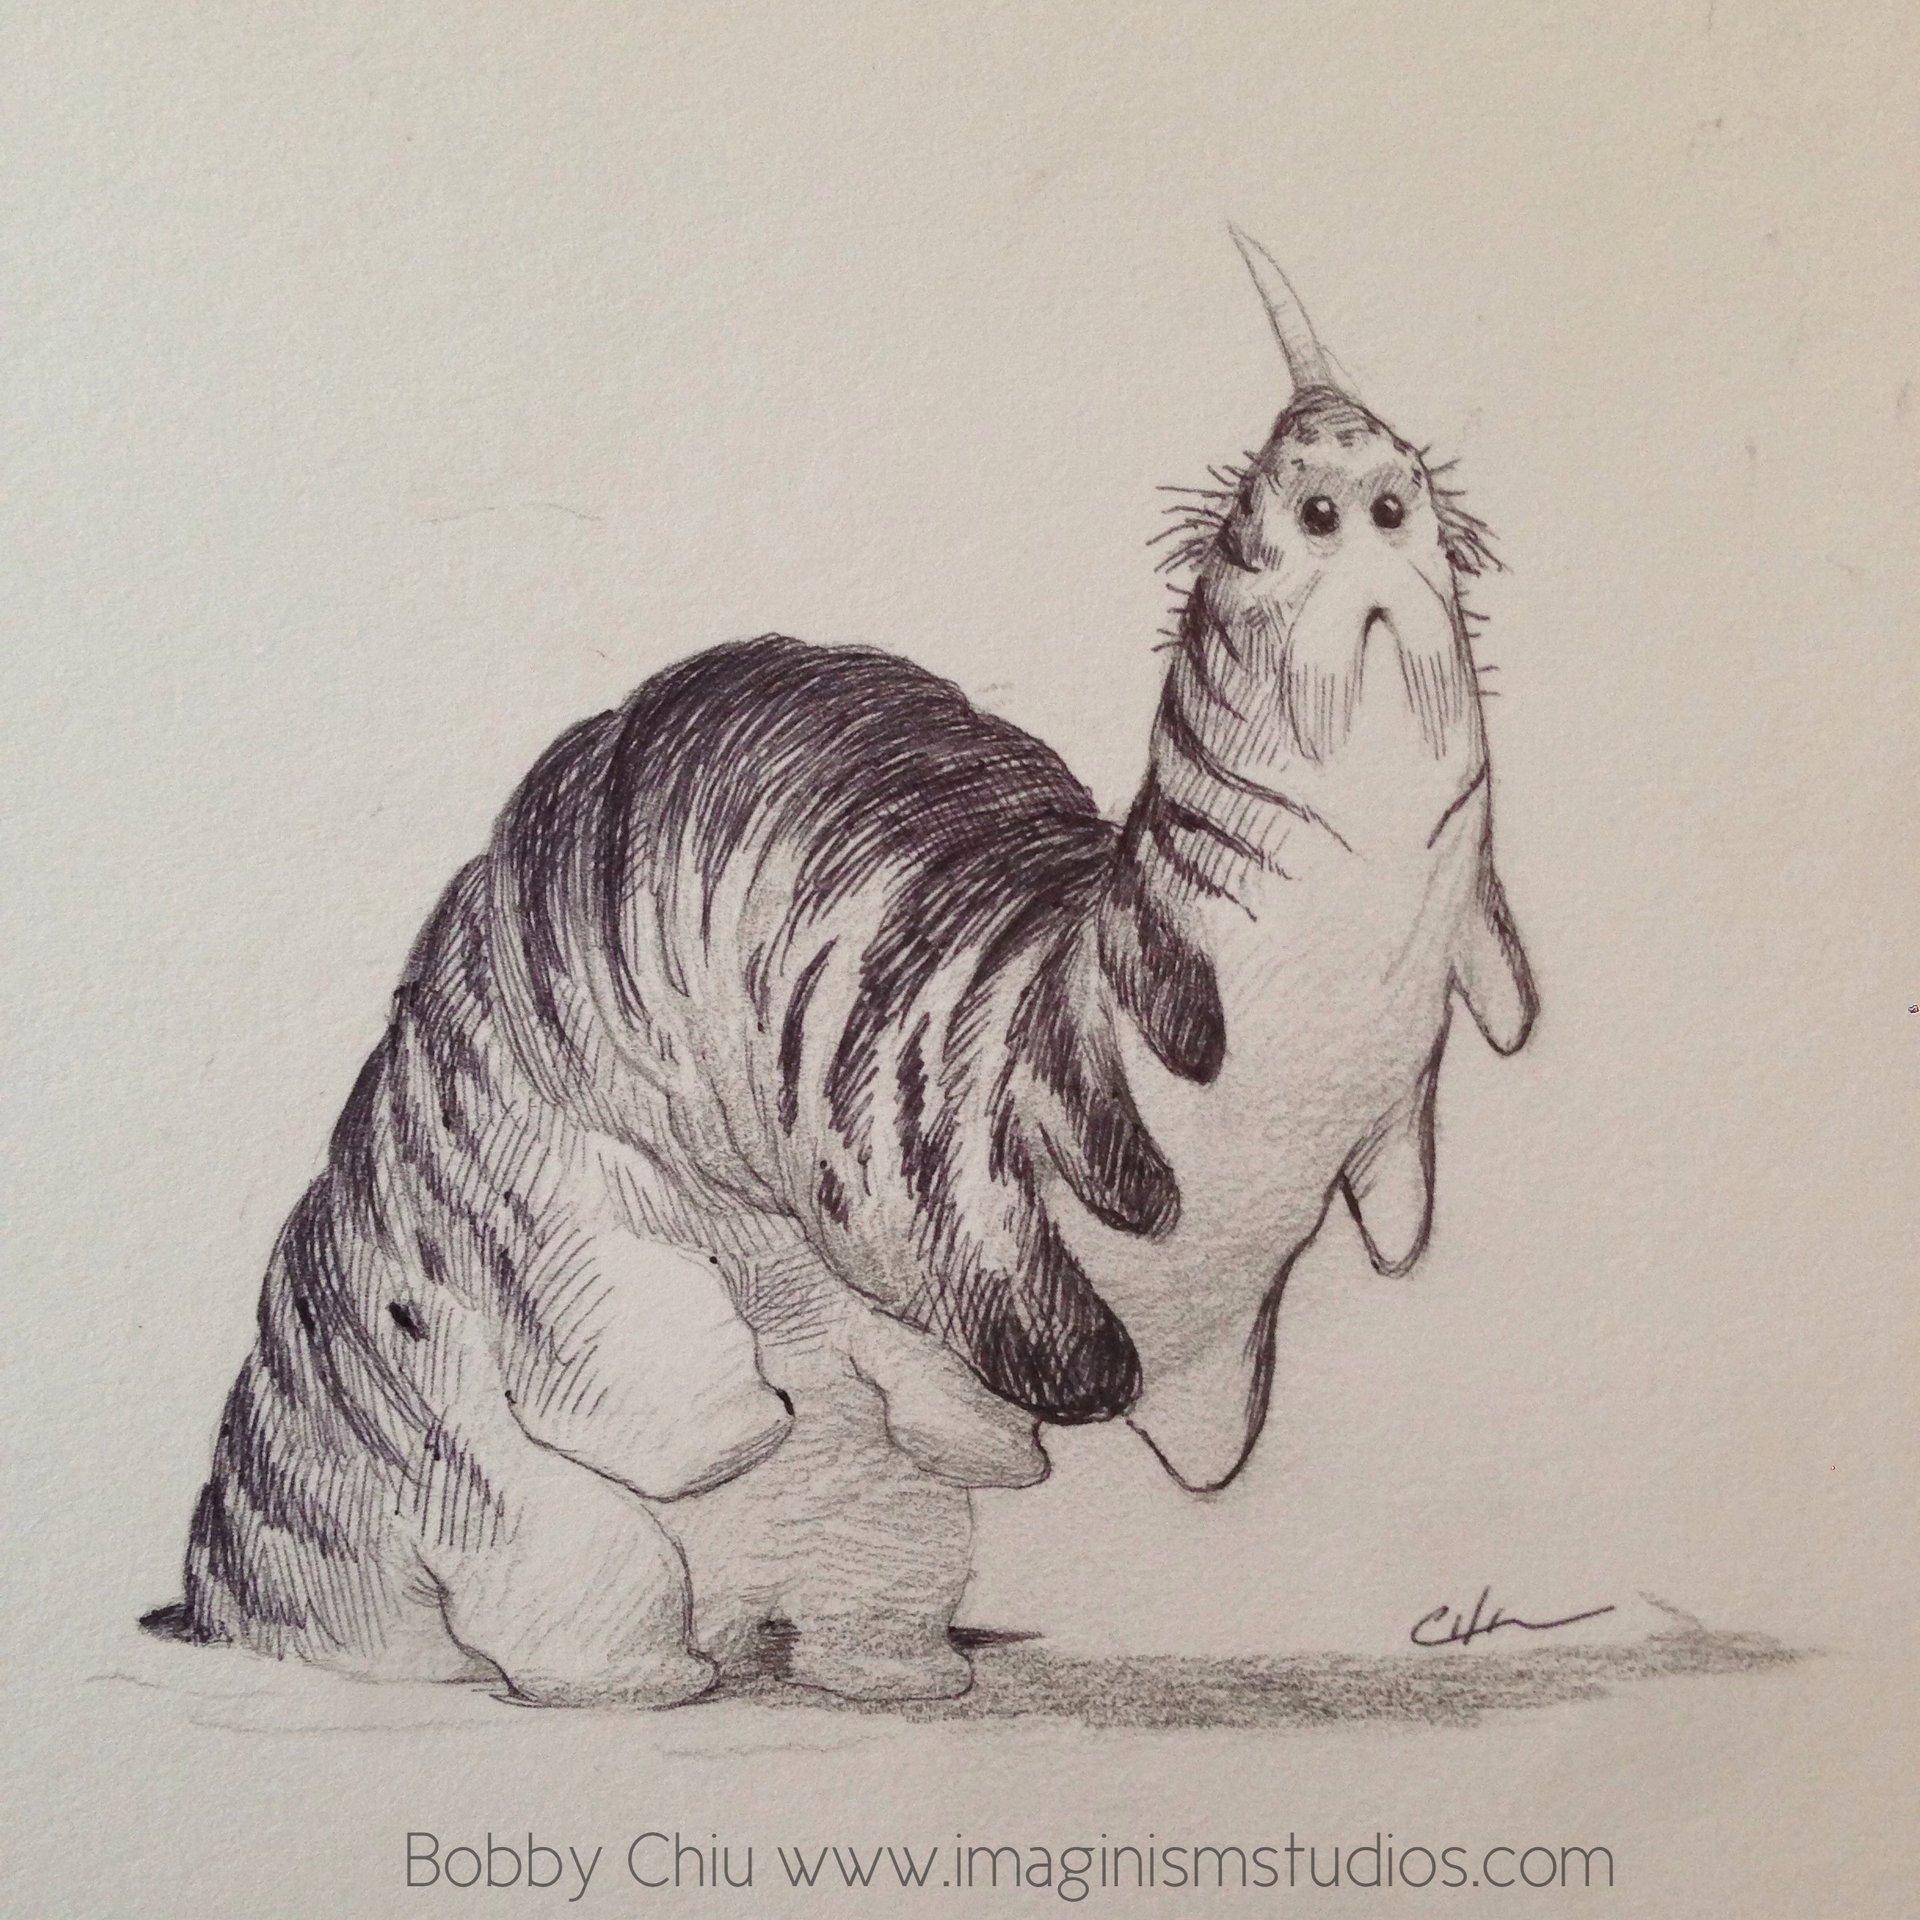 bobby-chiu-caterpillar-unicorn-by-imaginism-d7bghlm.jpg